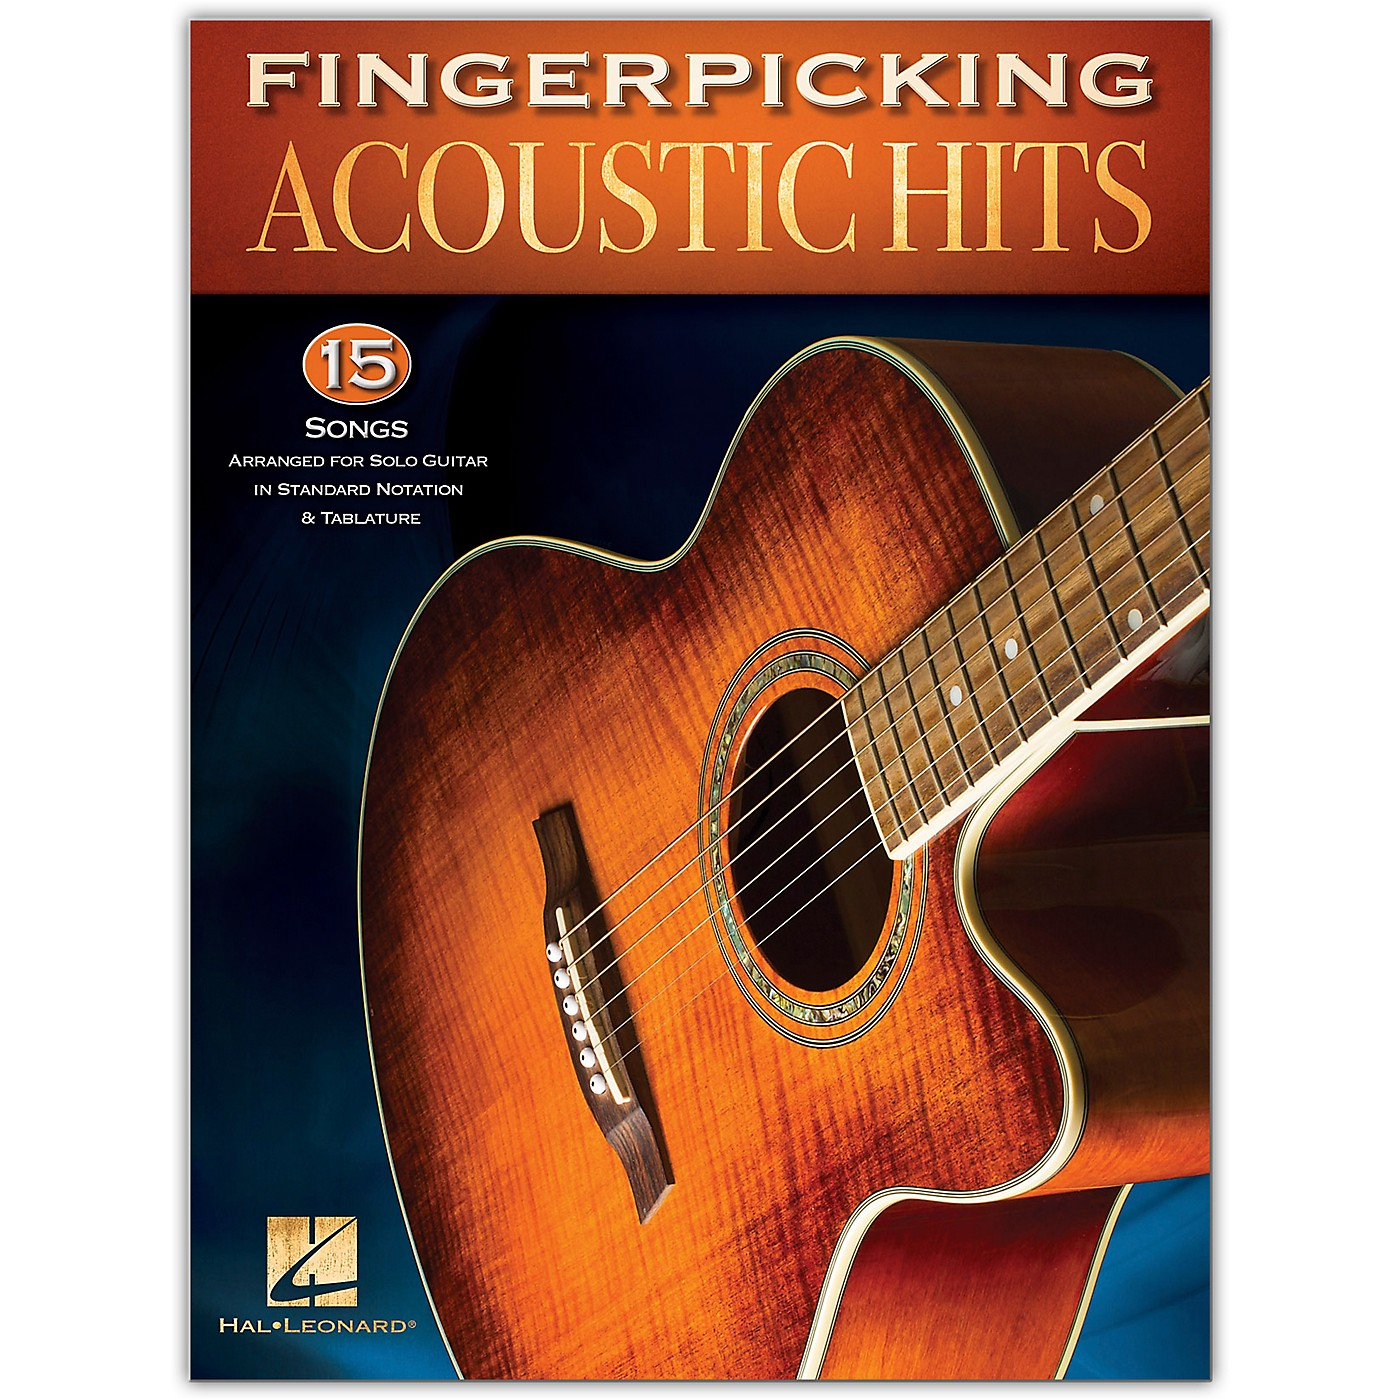 Hal Leonard Fingerpicking Acoustic Hits - 15 Songs Arranged for Solo Guitar in Standard Notation & Tab thumbnail